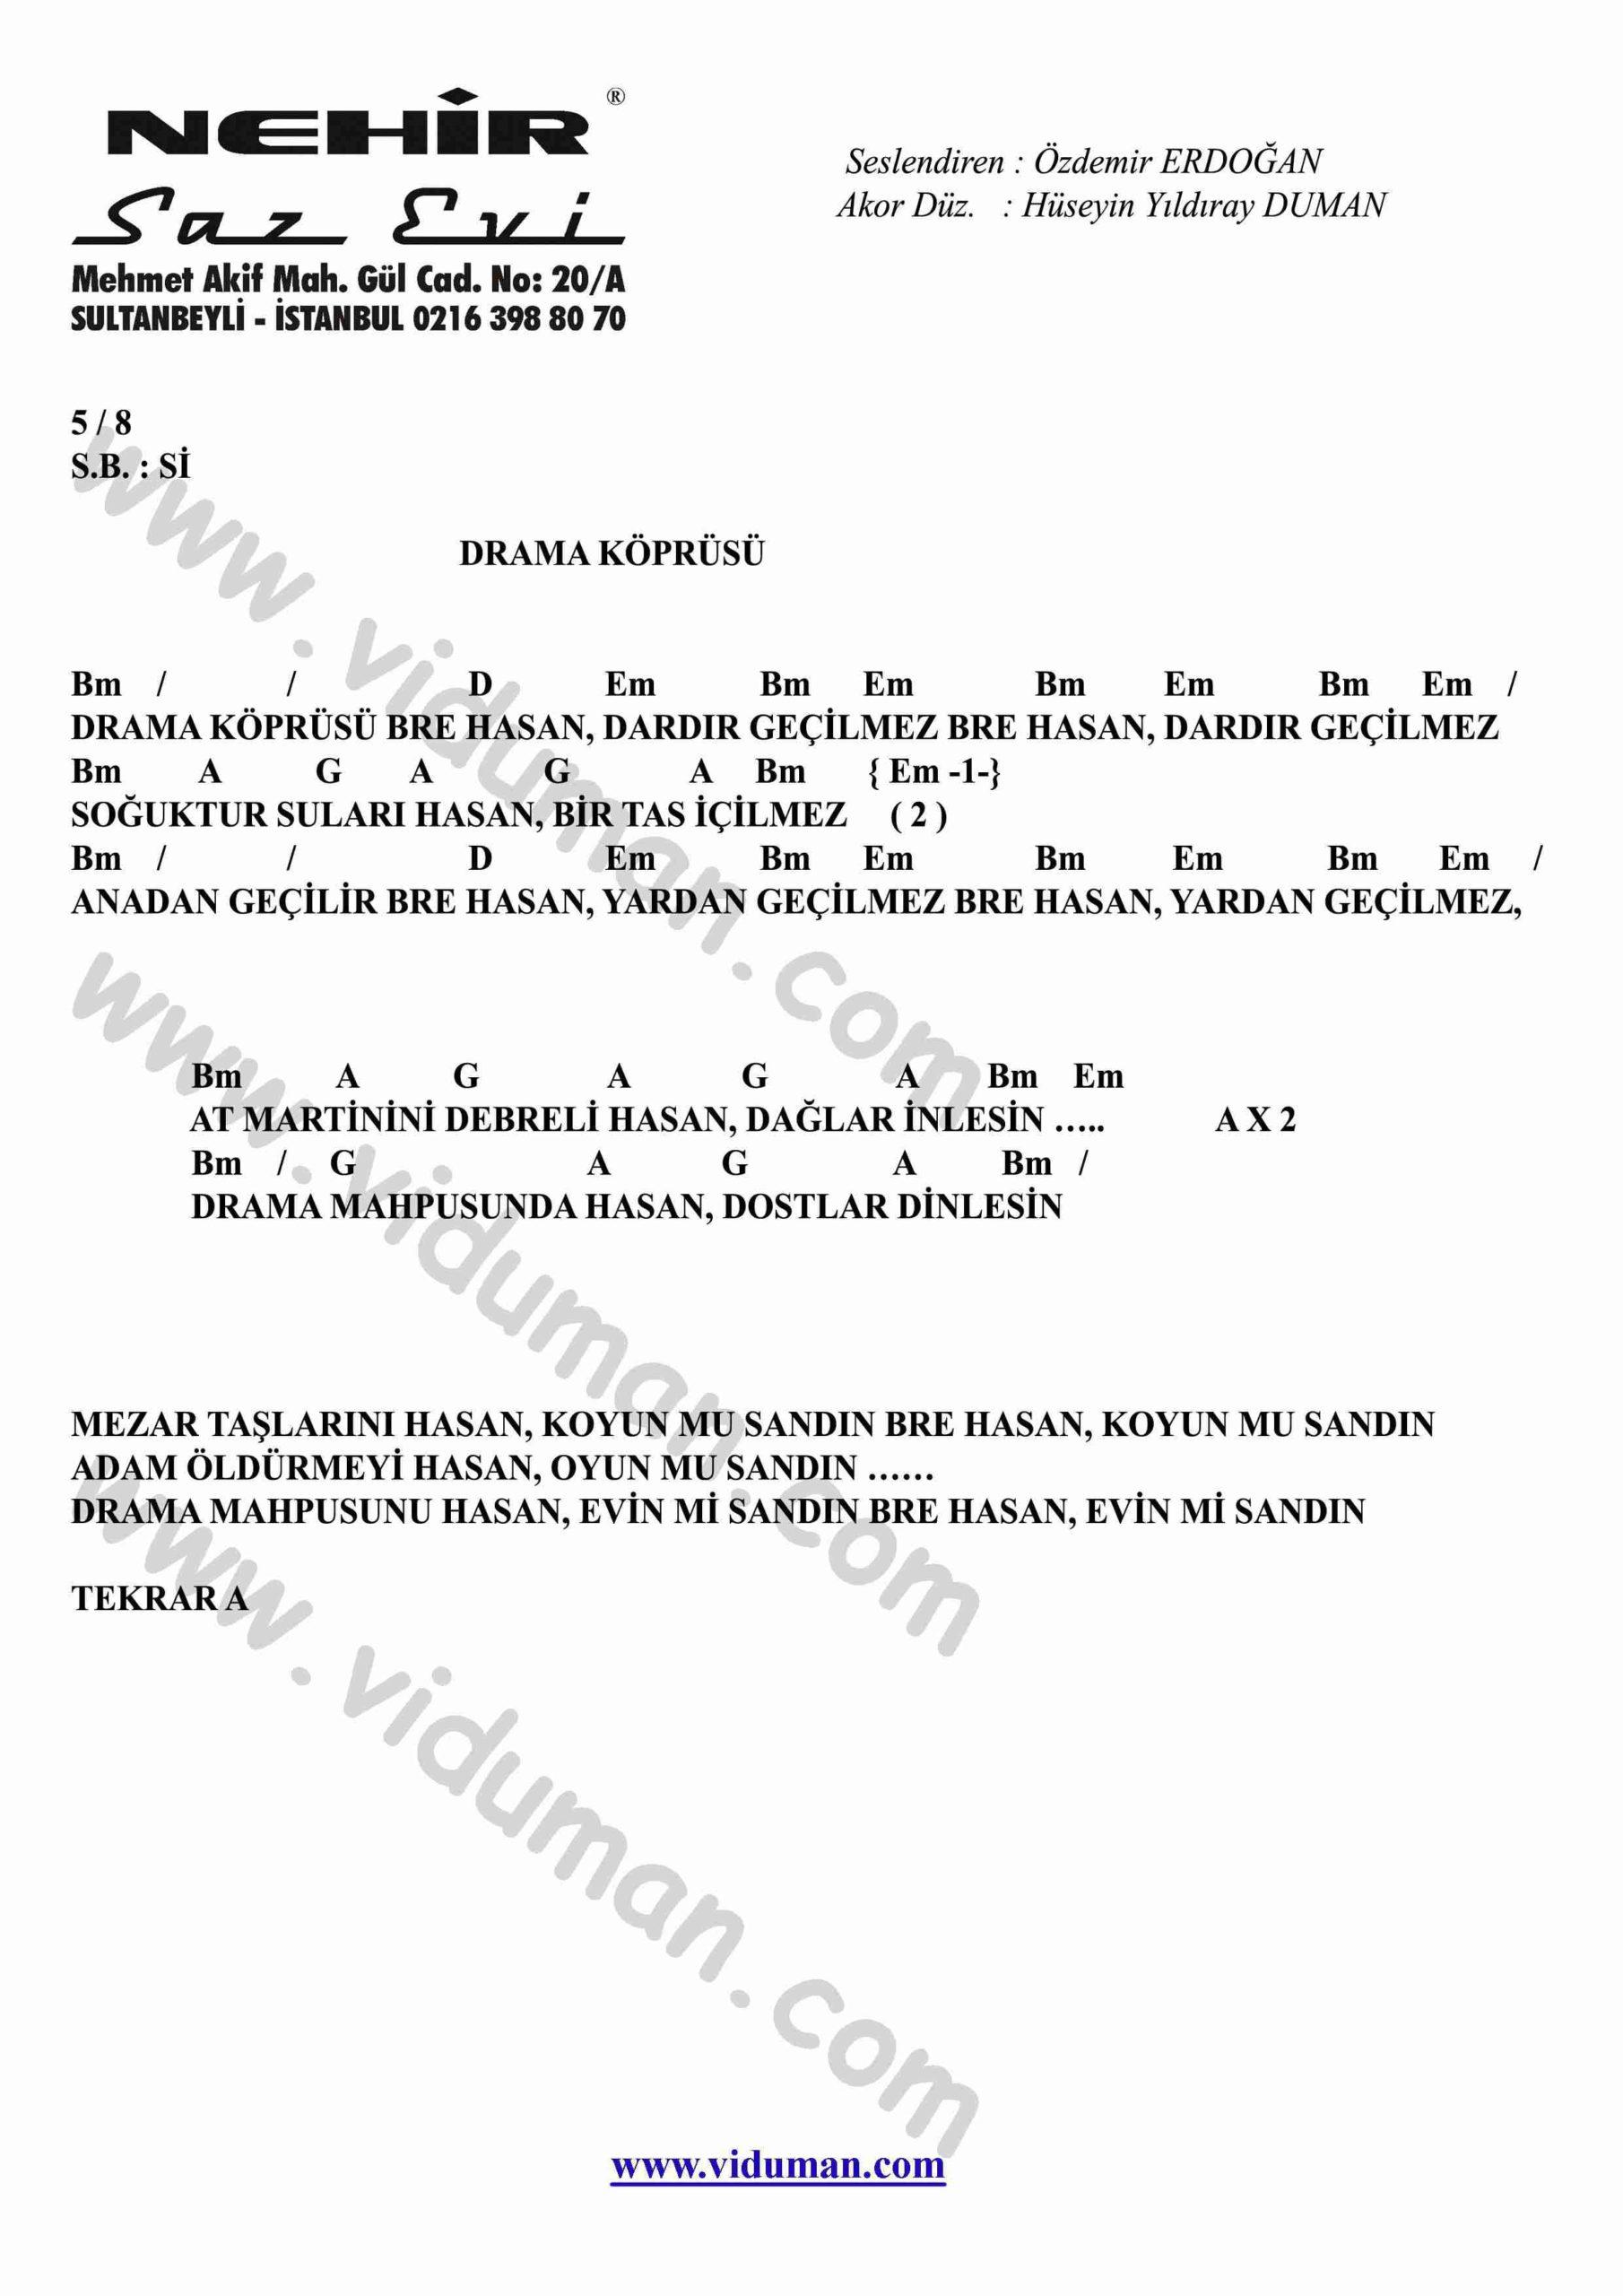 Drama Koprusu-Gitar-Ritim-Akorlari